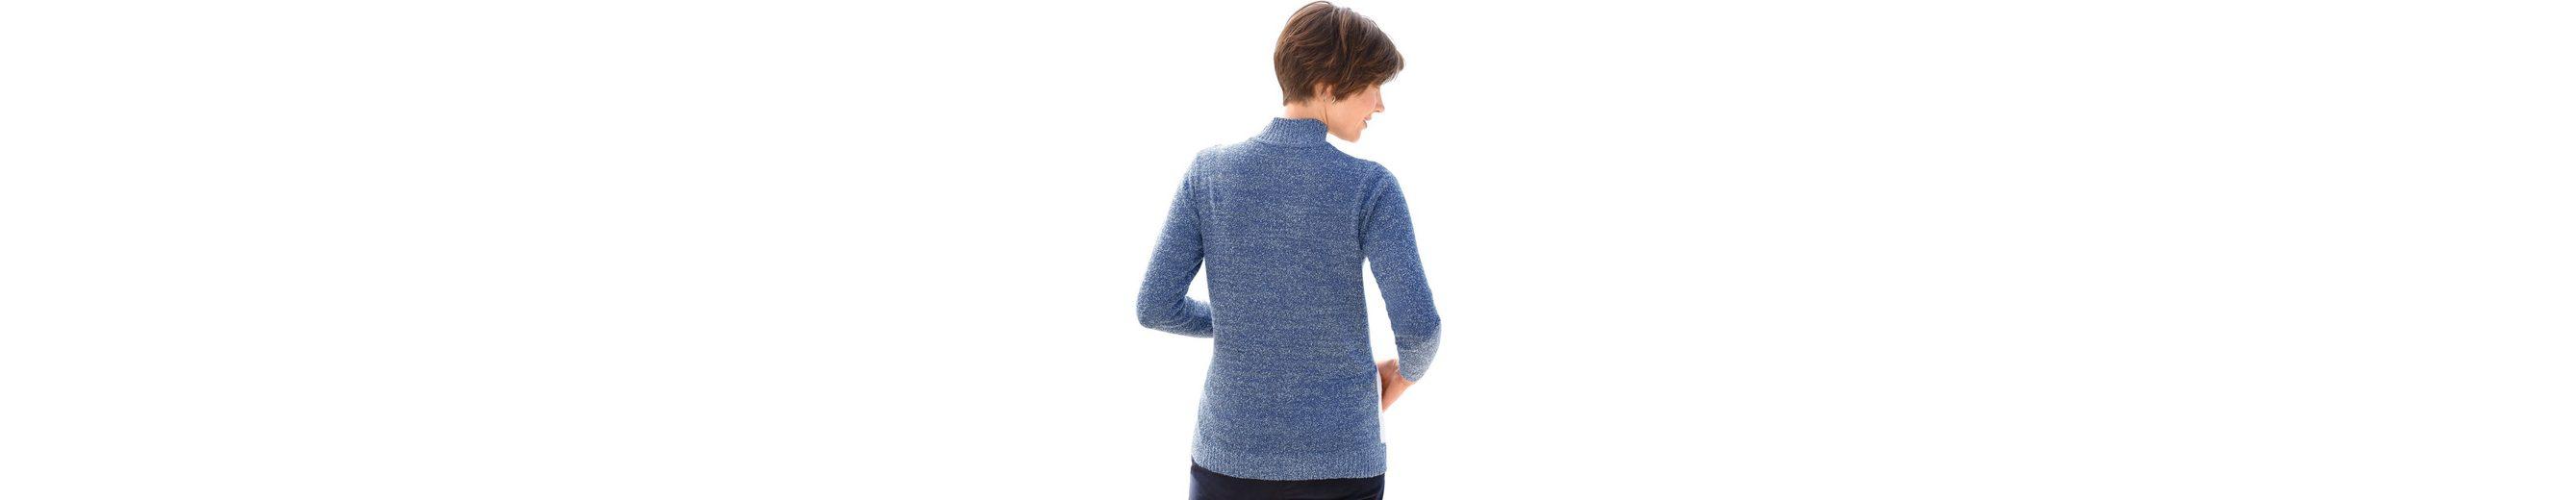 Classic Basics Pullover in flauschiger Bouclé-Qualität Billig Verkauf Limitierter Auflage Billig Footlocker Rabatt Original Yj3edJ